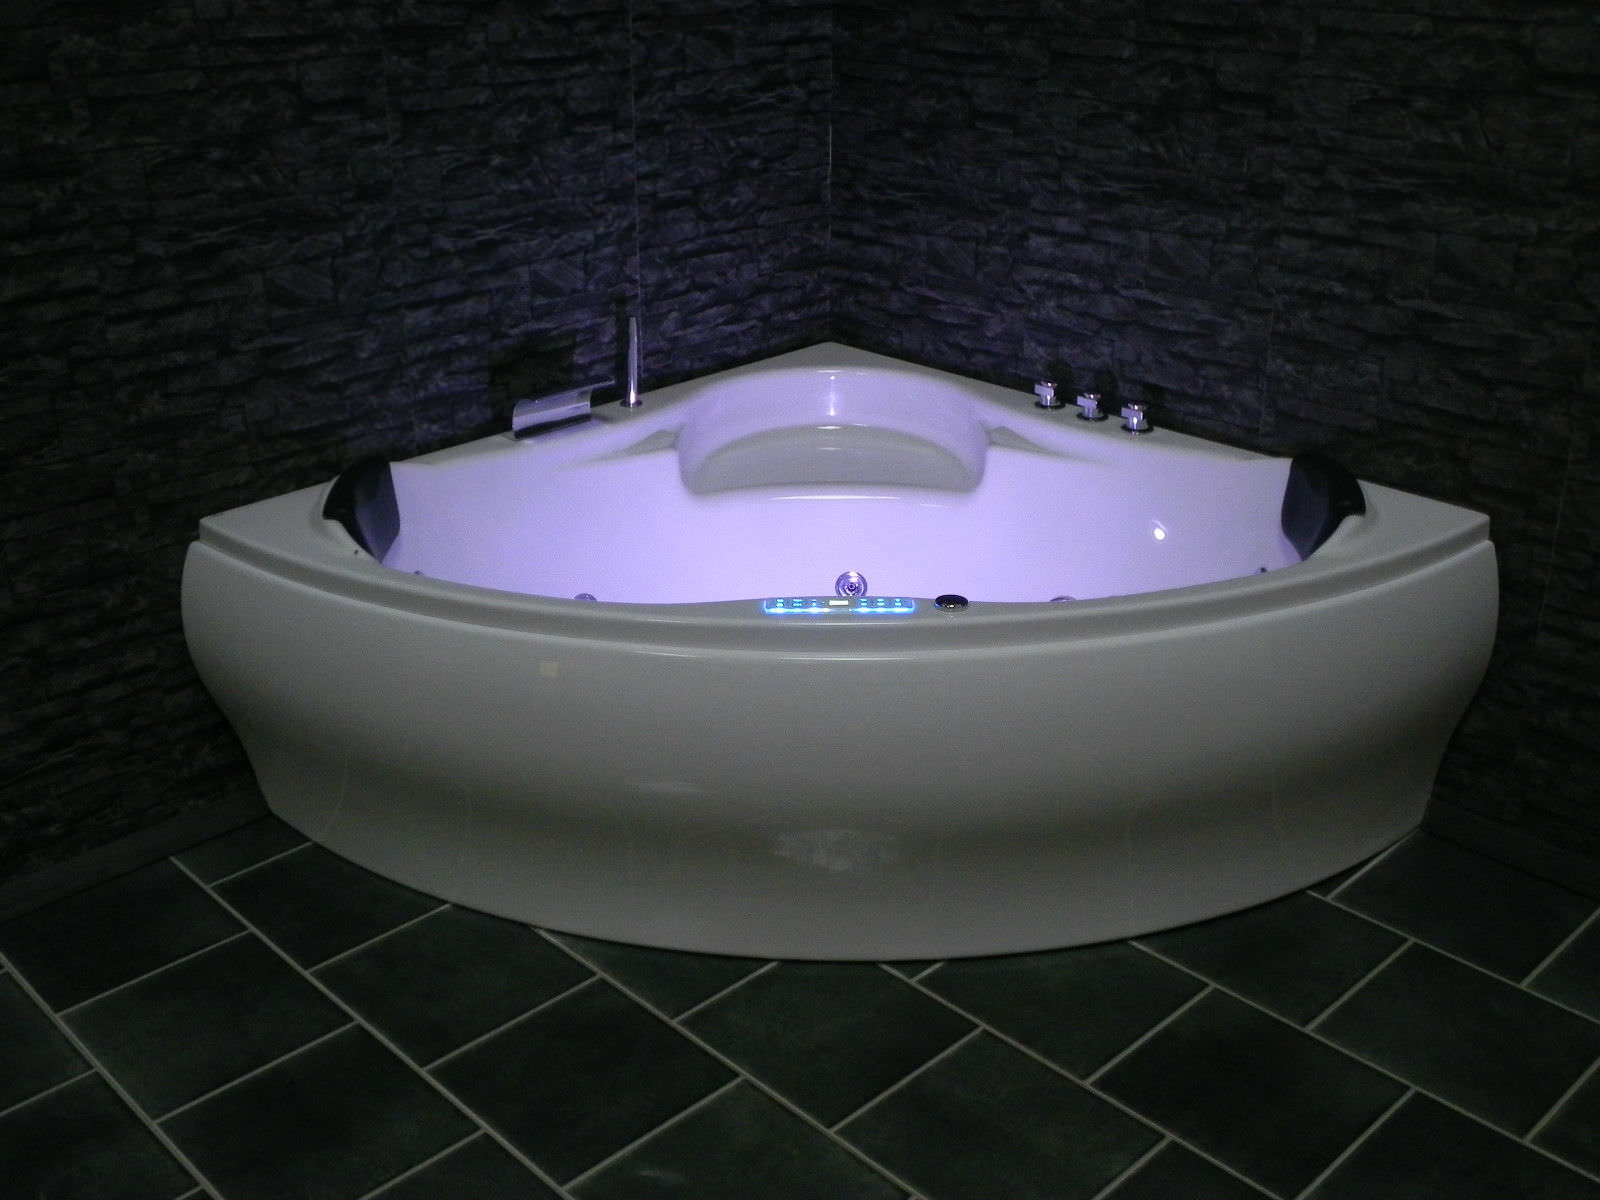 eckwhirlpool whirlpool badewanne jacuzzi pool dina made in. Black Bedroom Furniture Sets. Home Design Ideas